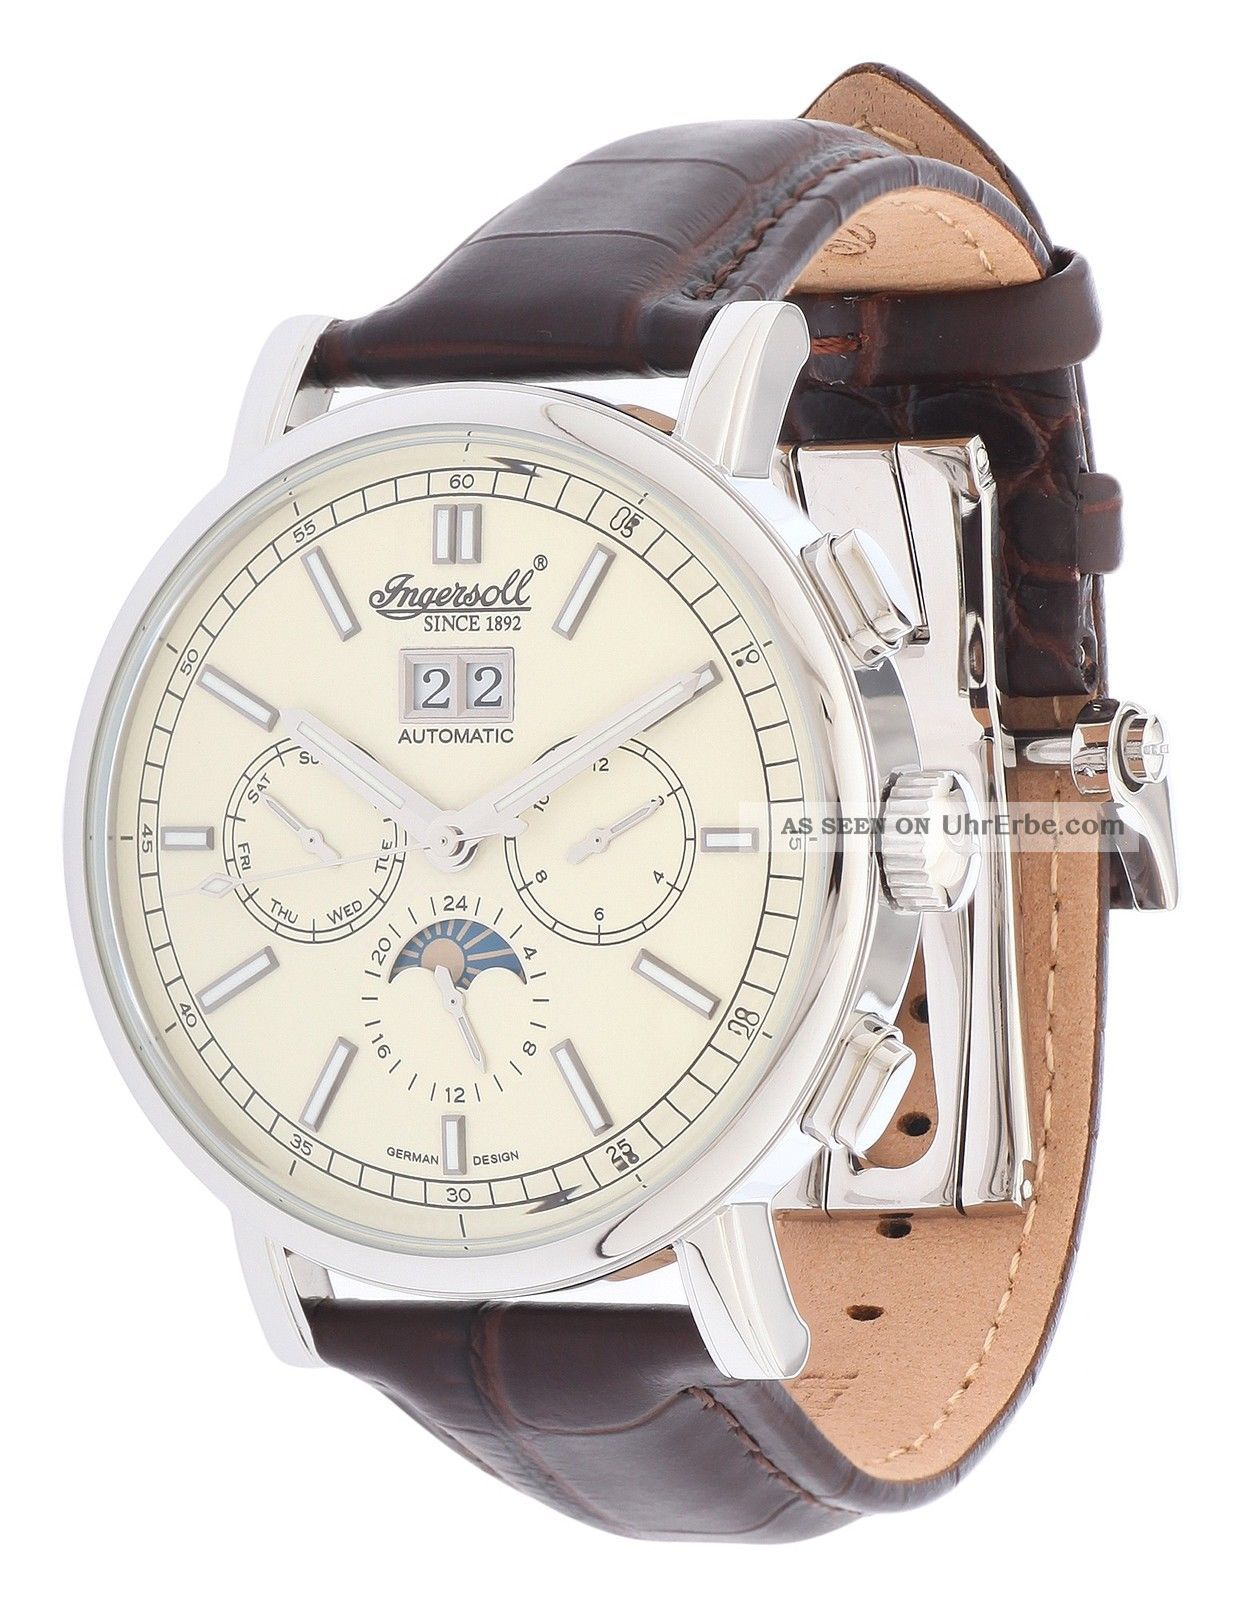 Ingersoll Herren Armbanduhr Anapolis Limited Edition Dunkelbraun In1402cr Armbanduhren Bild